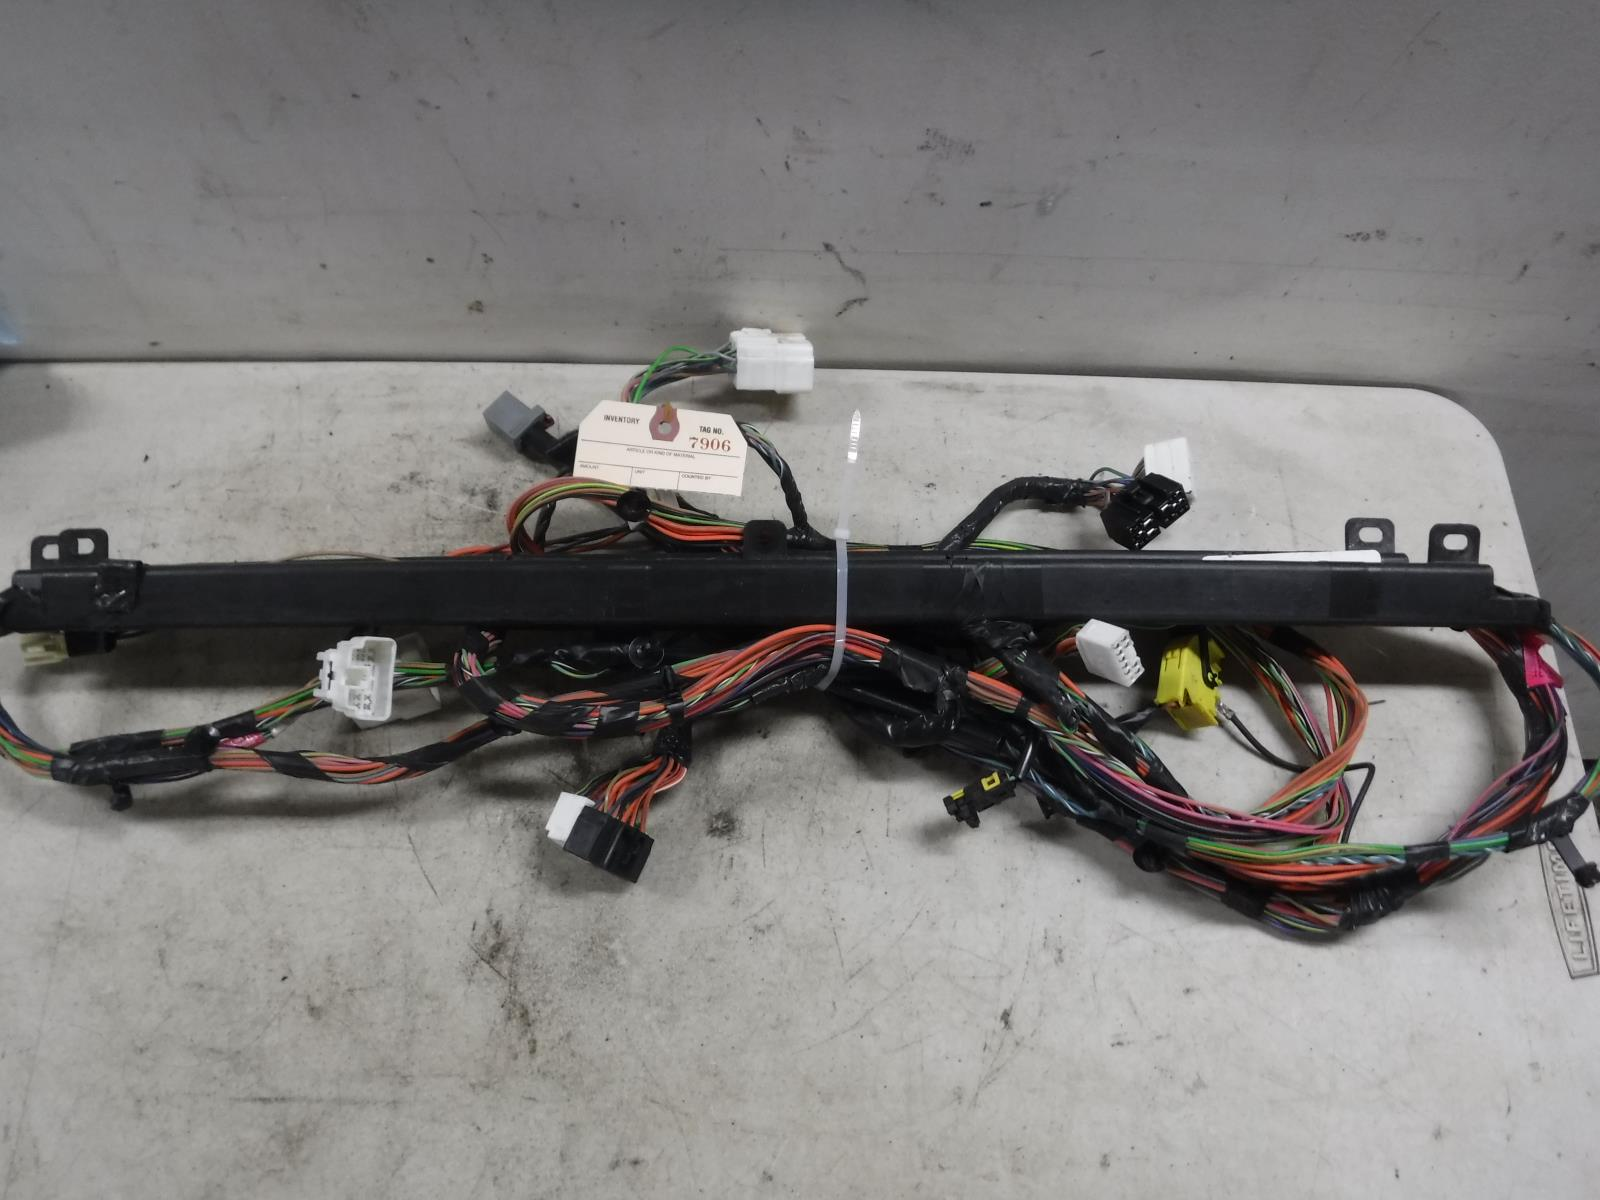 hight resolution of details about 2003 2004 dodge ram slt 1500 crew cab auto 4x4 hemi cab wiring harness oem